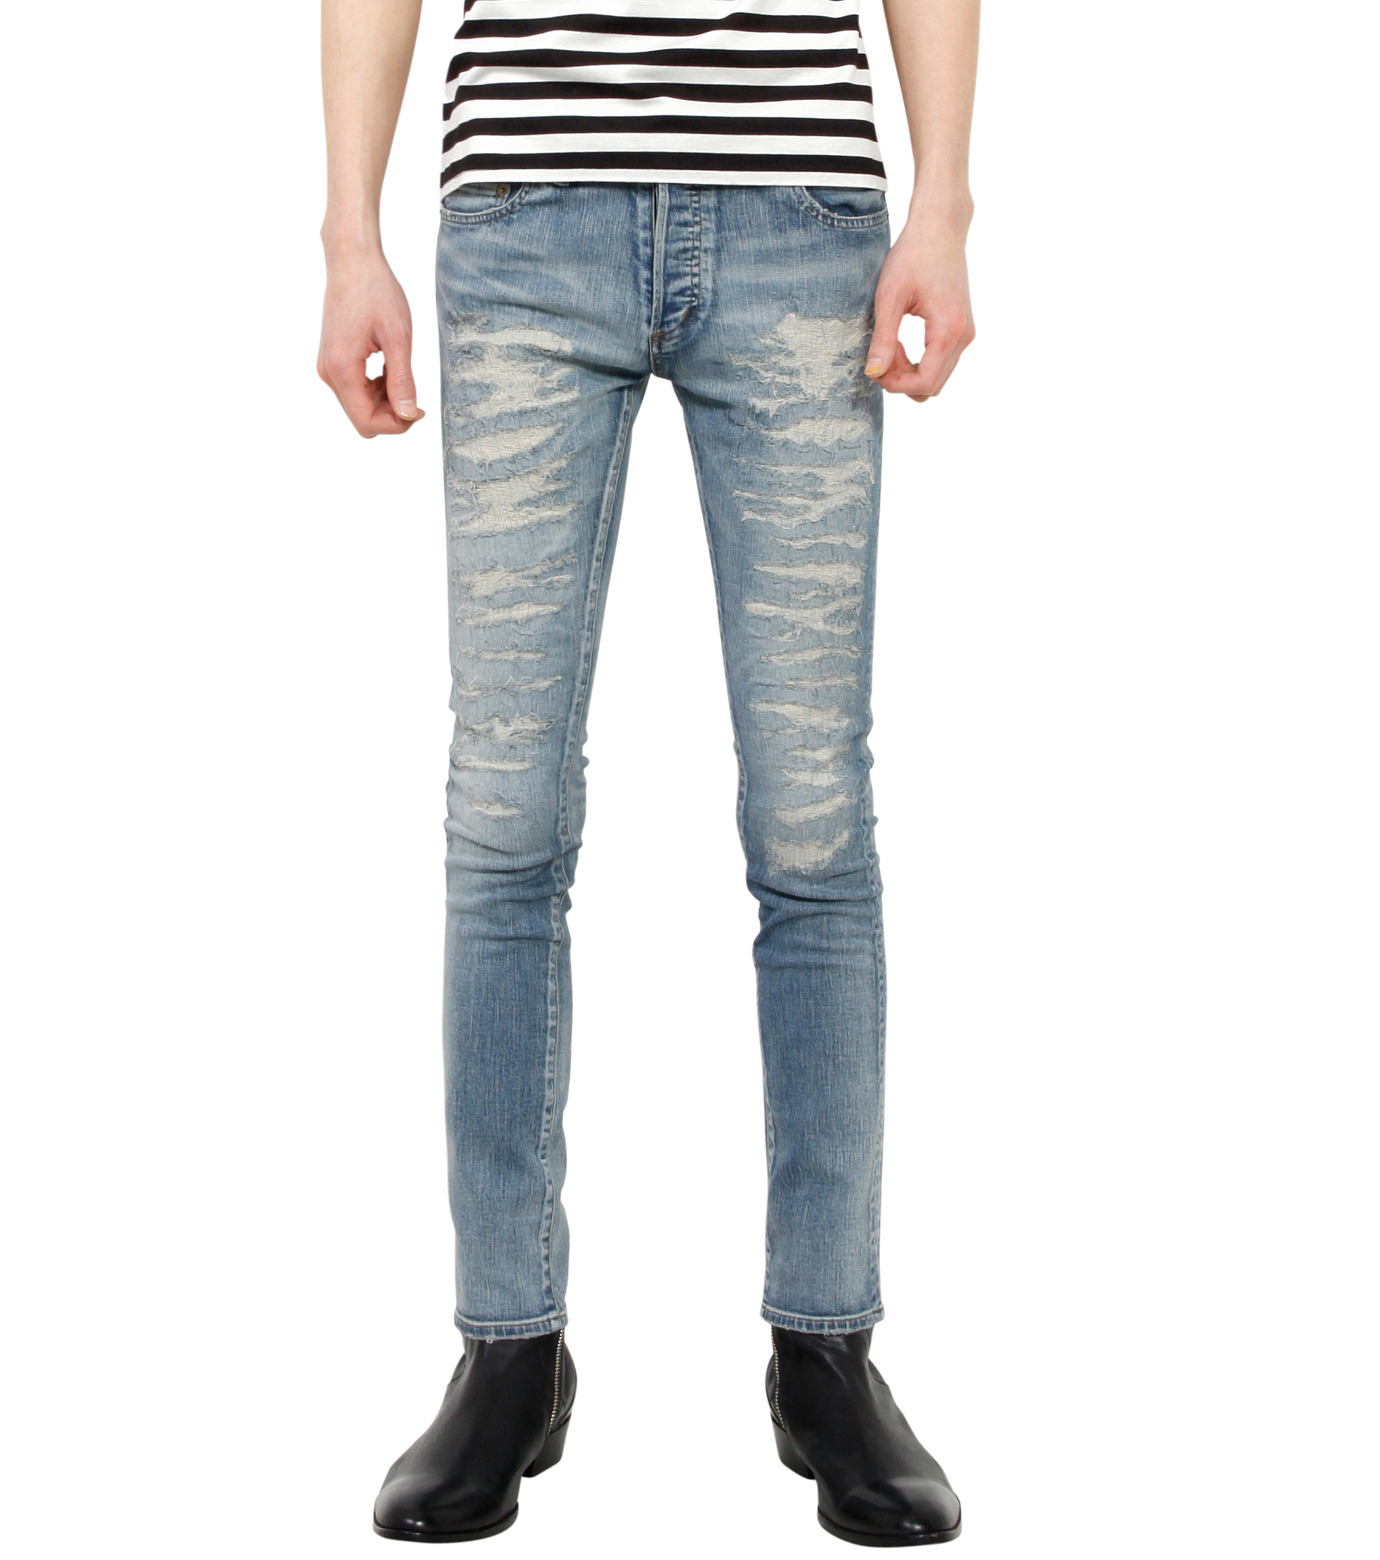 HL HEDDIE LOVU(エイチエル・エディールーヴ)のind damage3 skin slim-BLUE(パンツ/pants)-18S98002-92 拡大詳細画像1